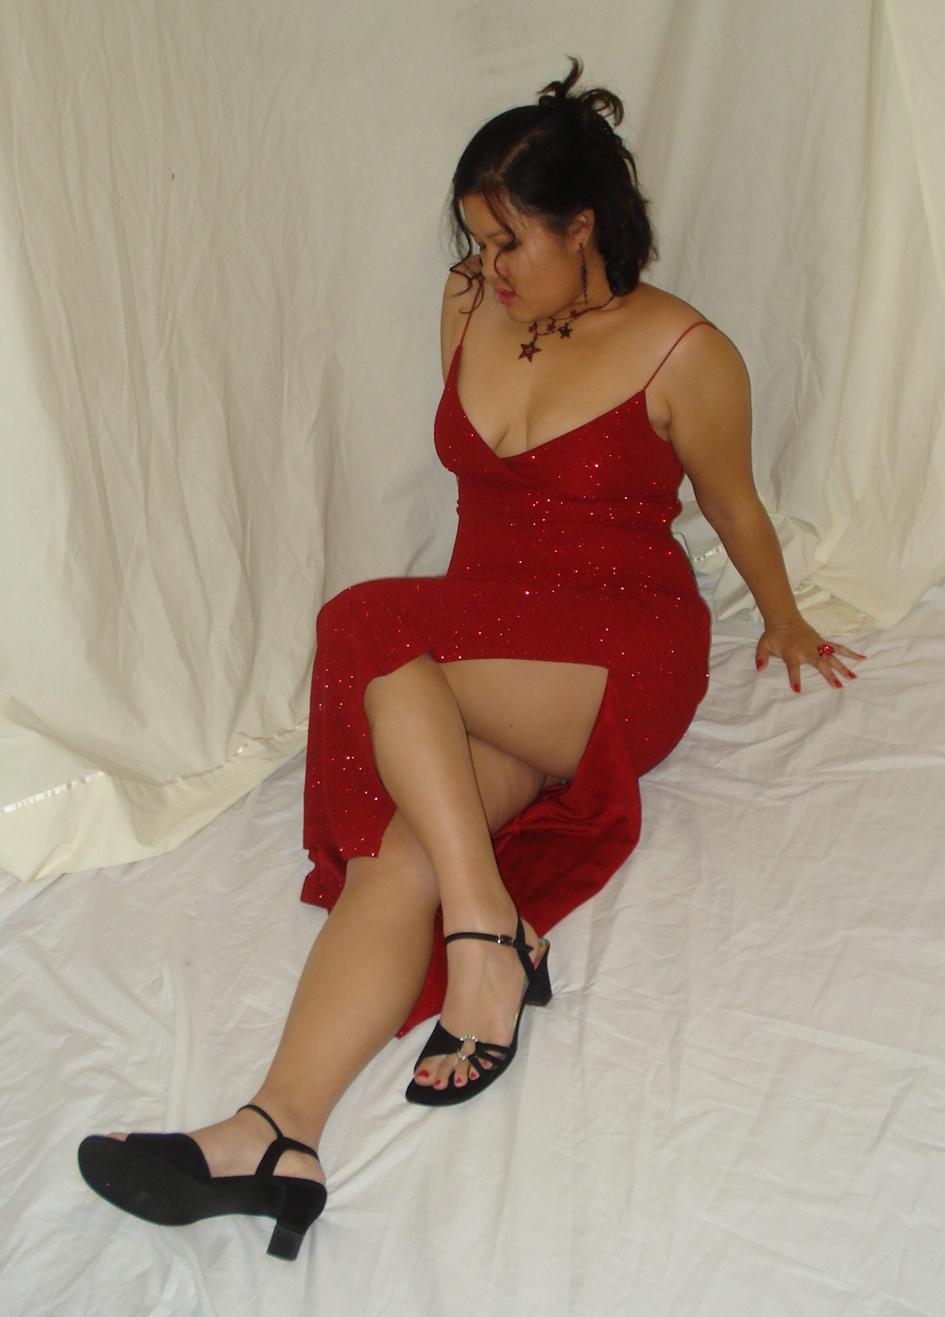 Ruby Sparkle 18 by MajesticStock